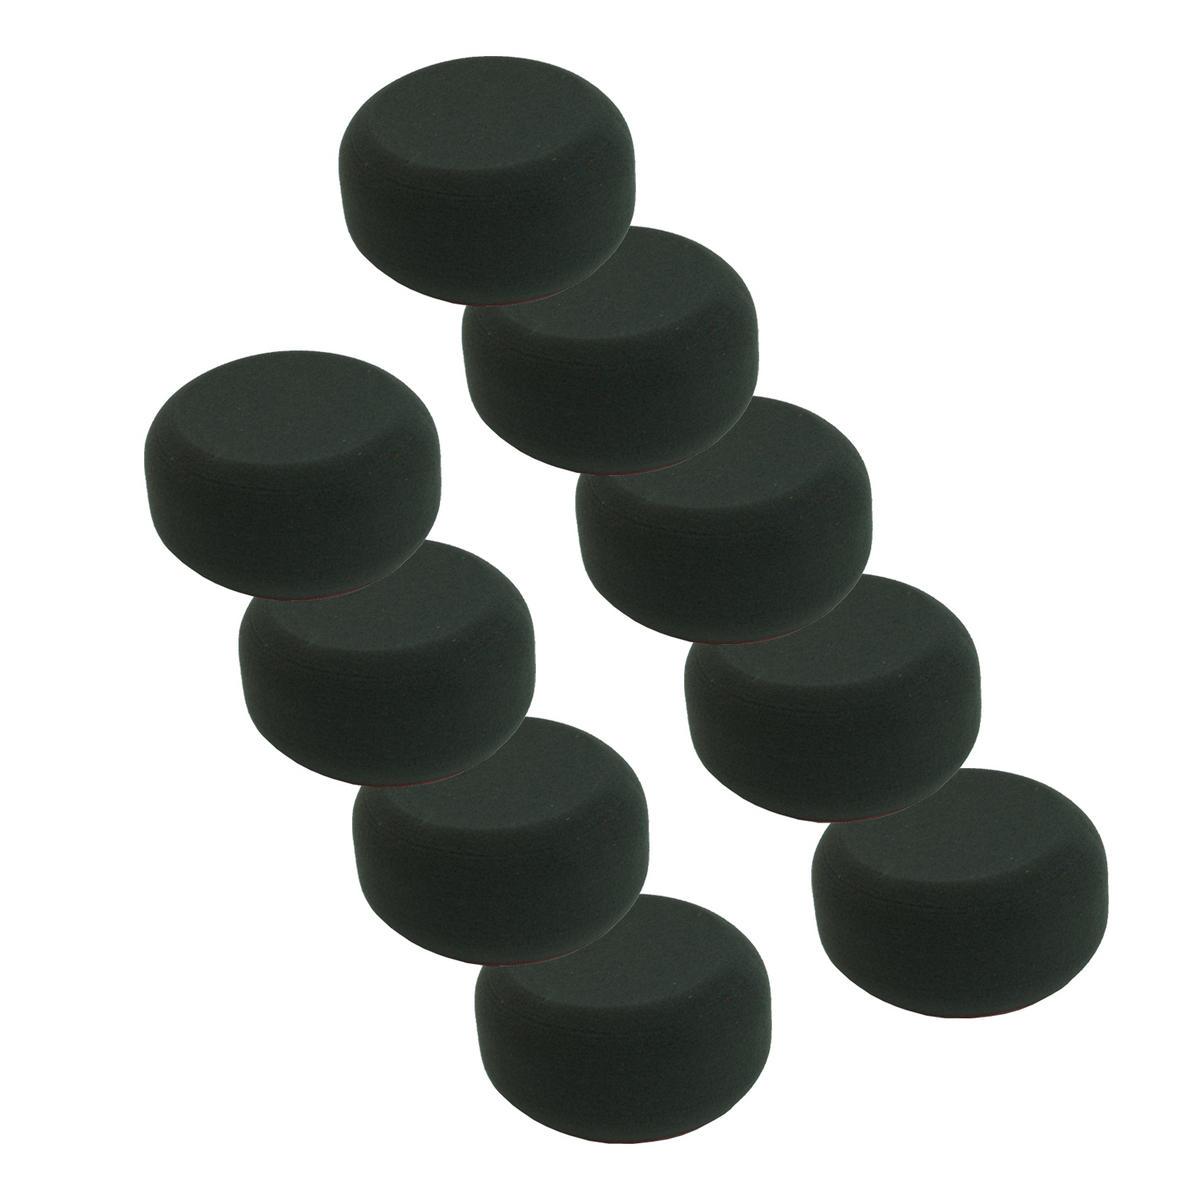 Car Cleaning 90mm Black Soft Velcro Polishing Cutting Detailing Mop Head x 9